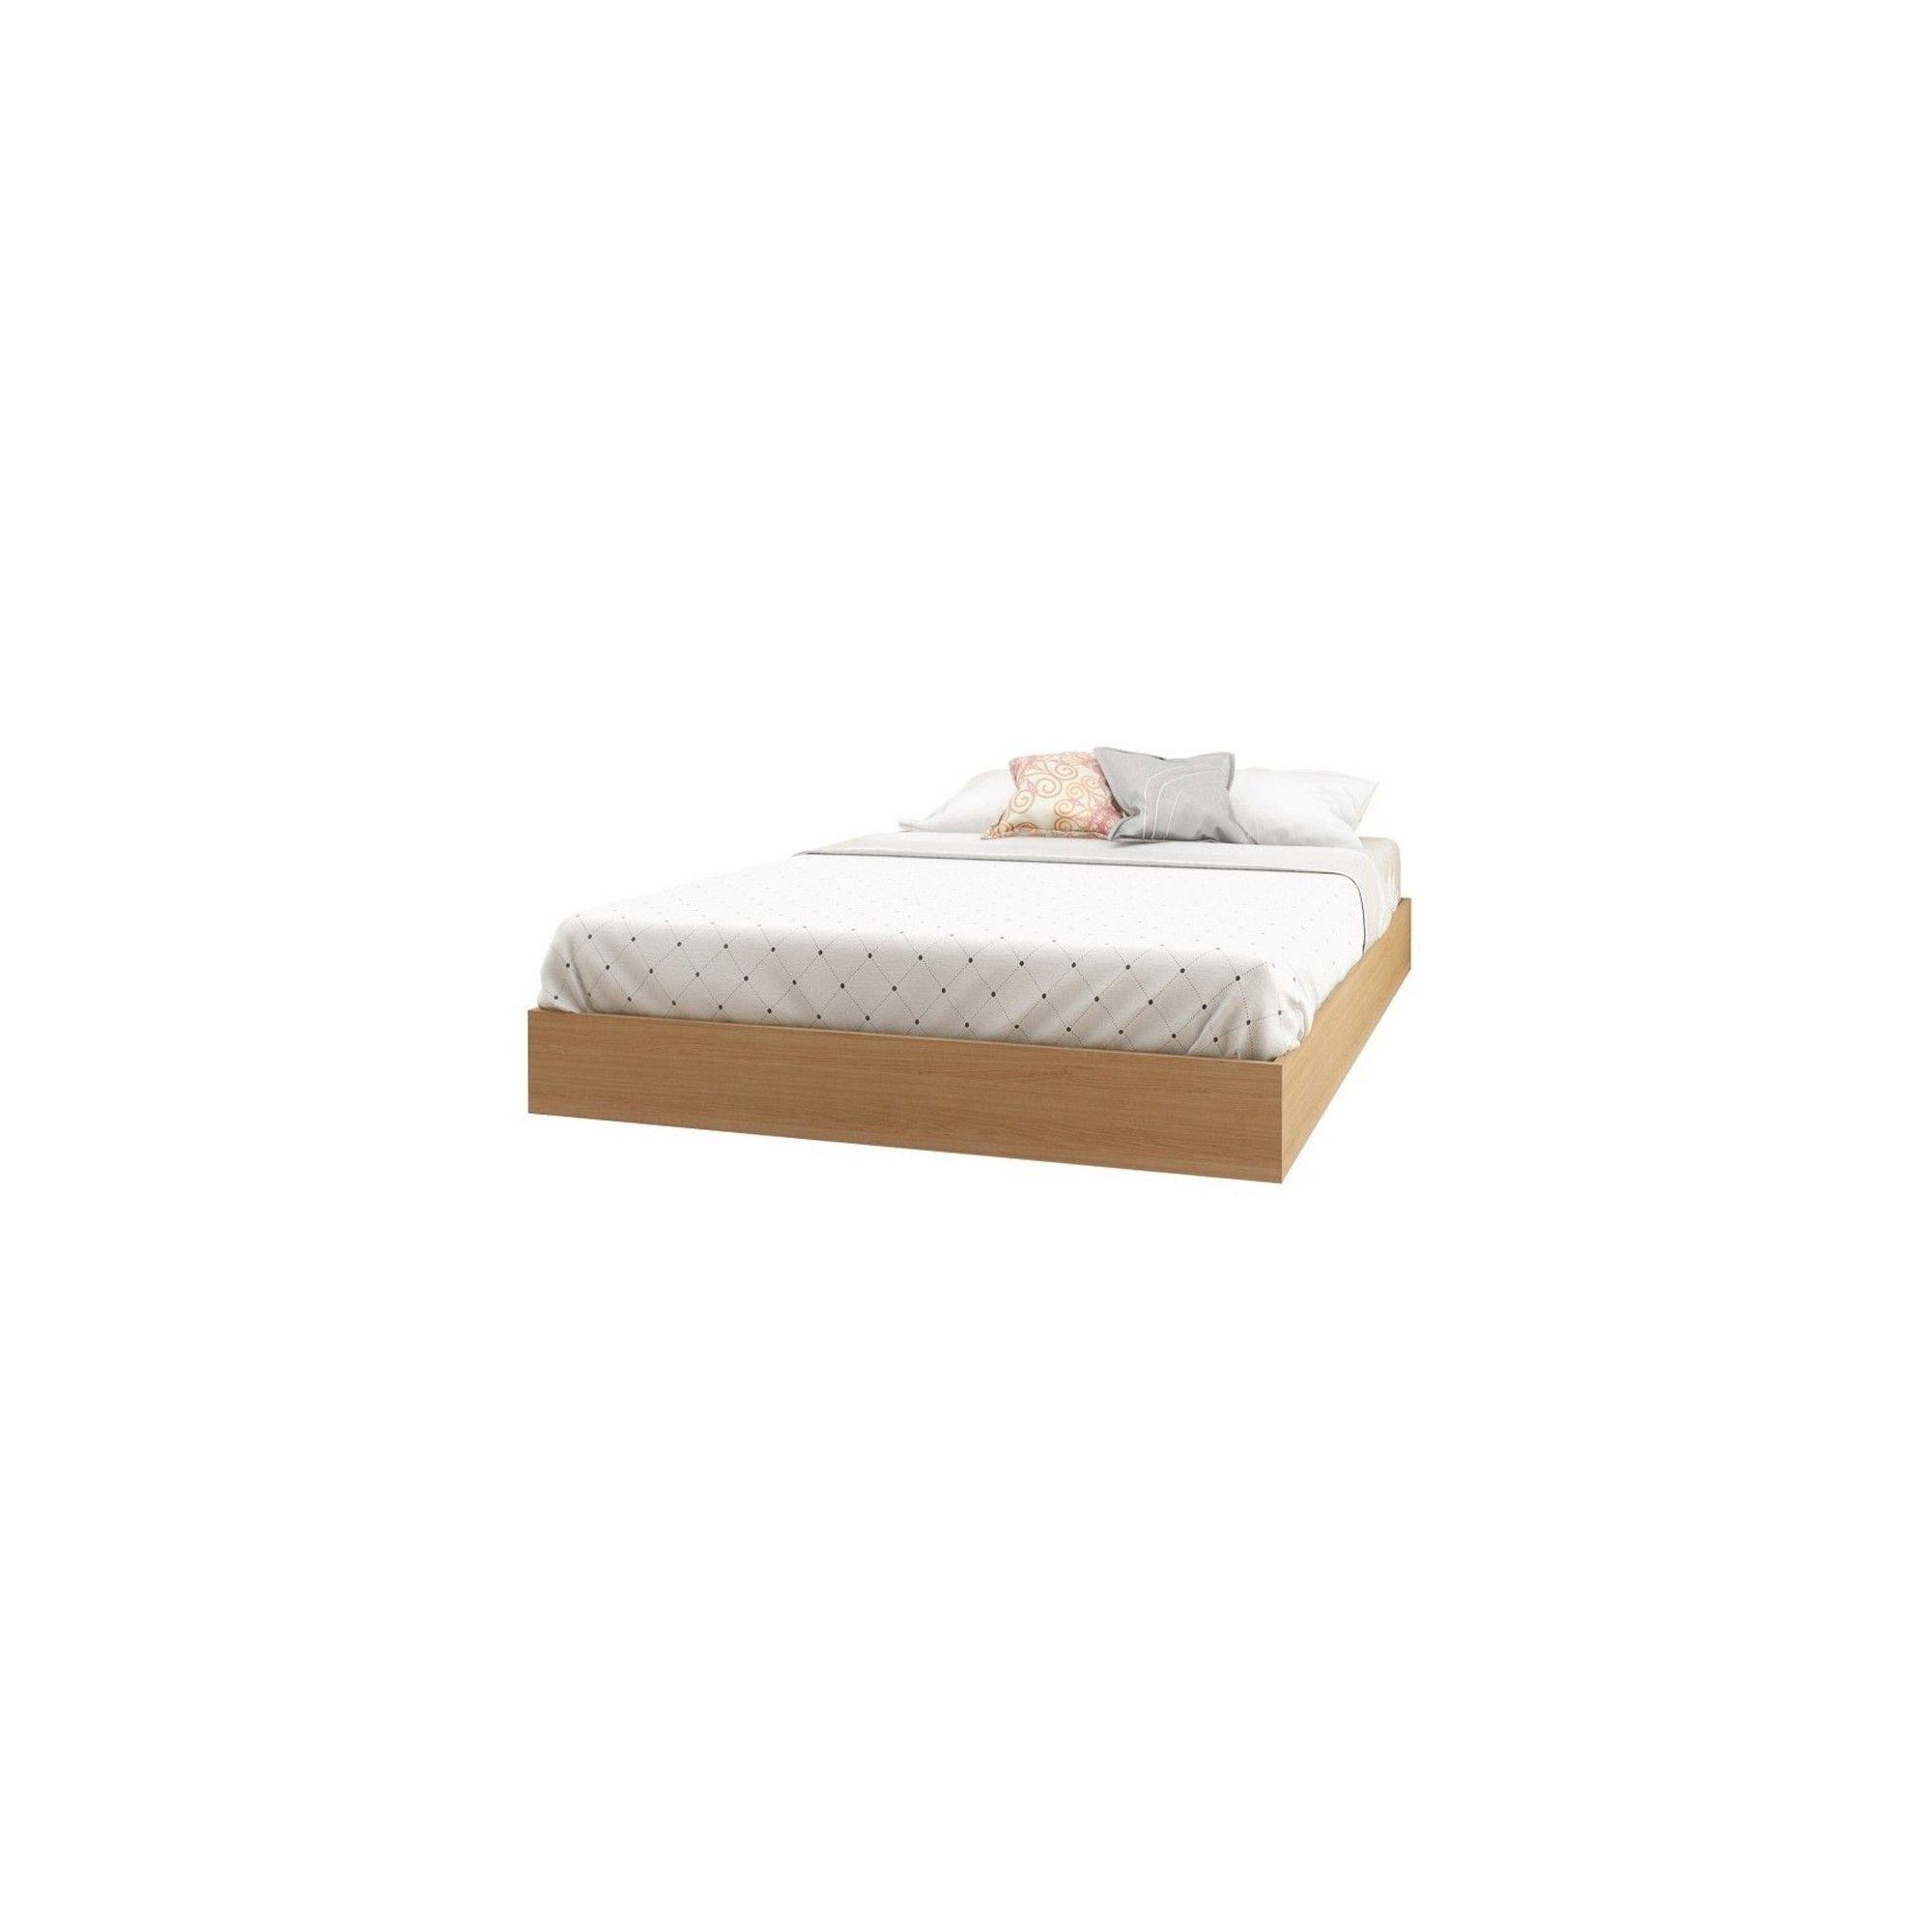 3d75a7d09274 Stockholm Full Size Platform Bed - Natural Maple - Nexera